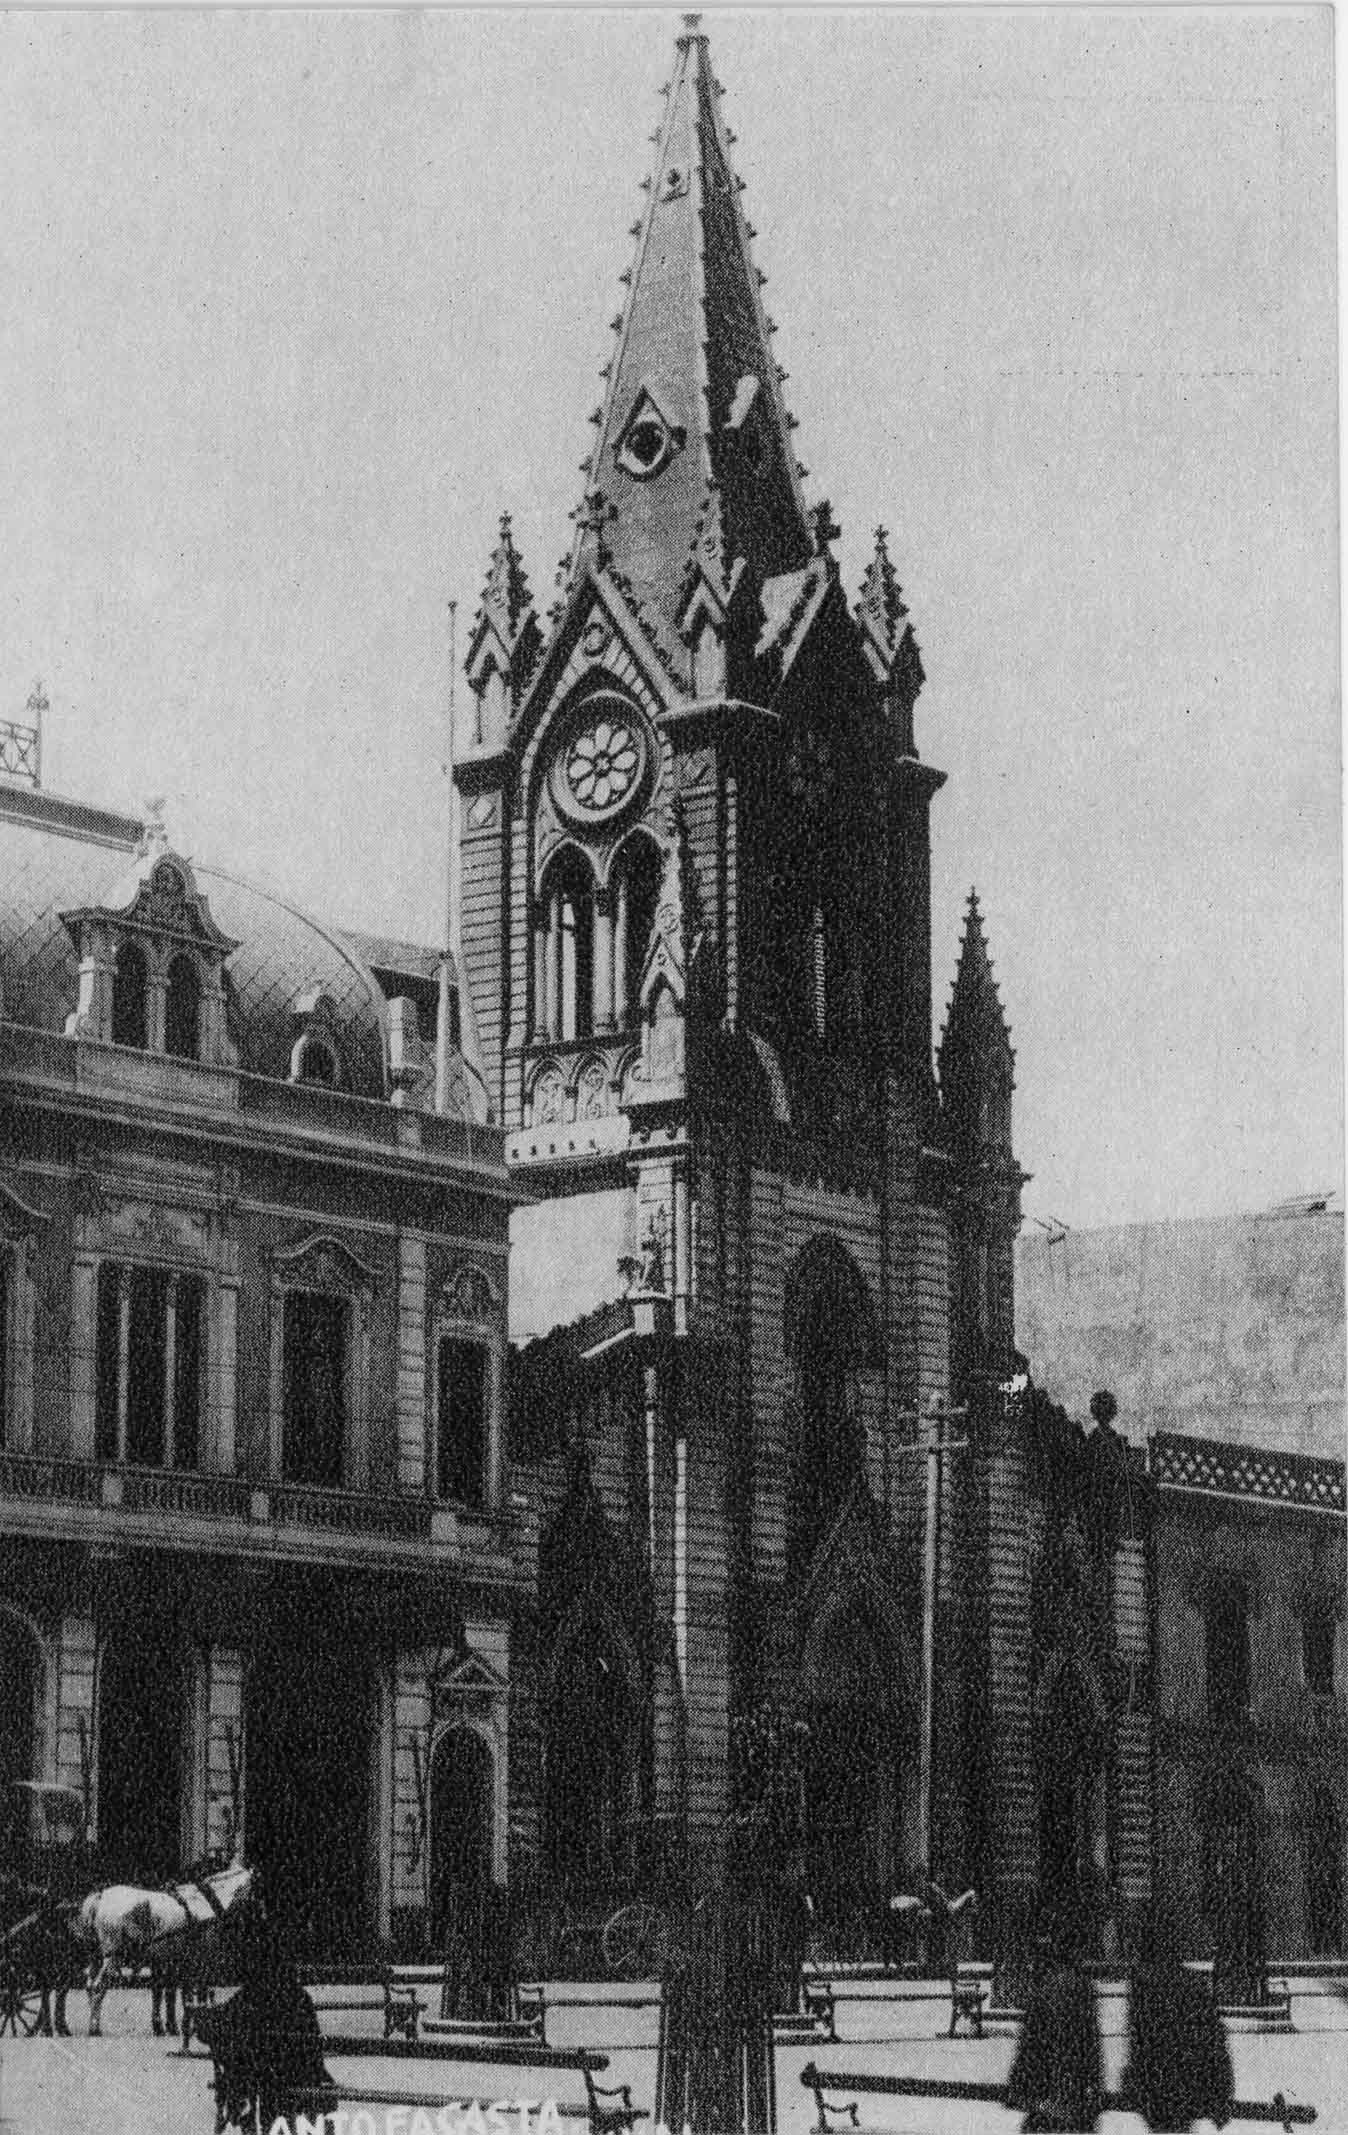 Enterreno - Fotos históricas de chile - fotos antiguas de Chile - Iglesia de Antofagasta ca. 1920